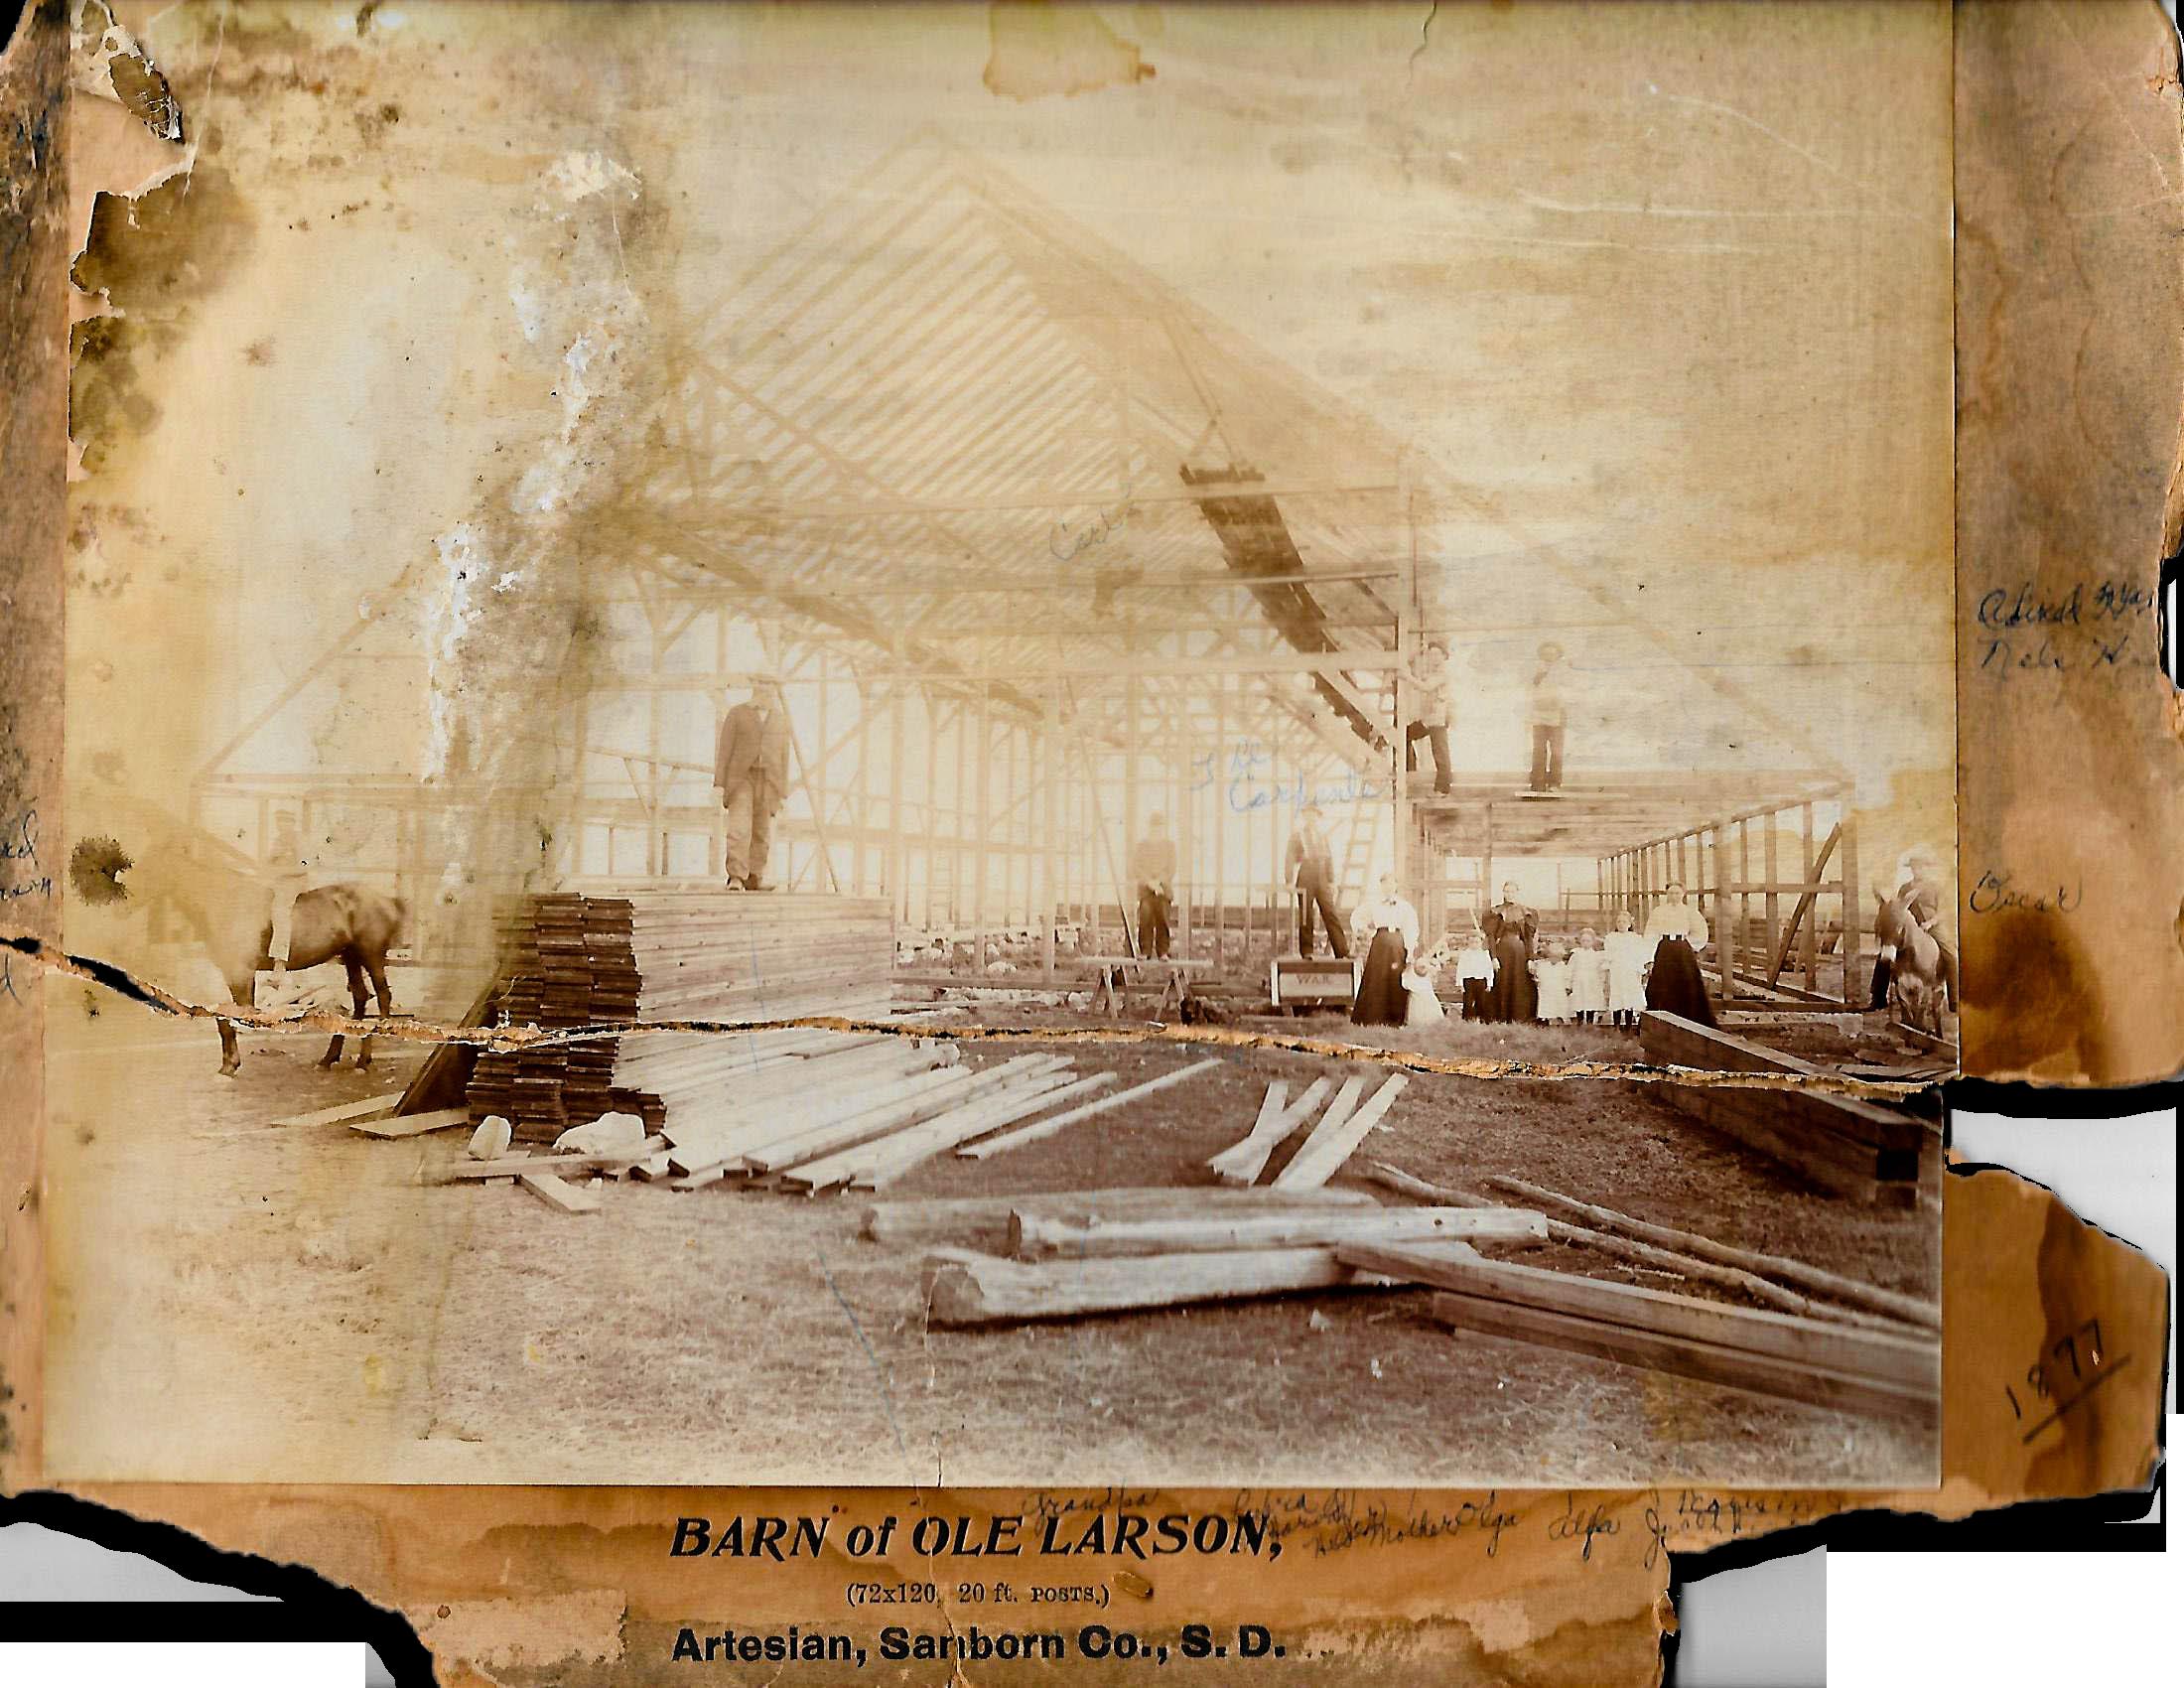 1st Generation  - Barn built by David's great-grandpa in Artesian, South Dakota, in 1897